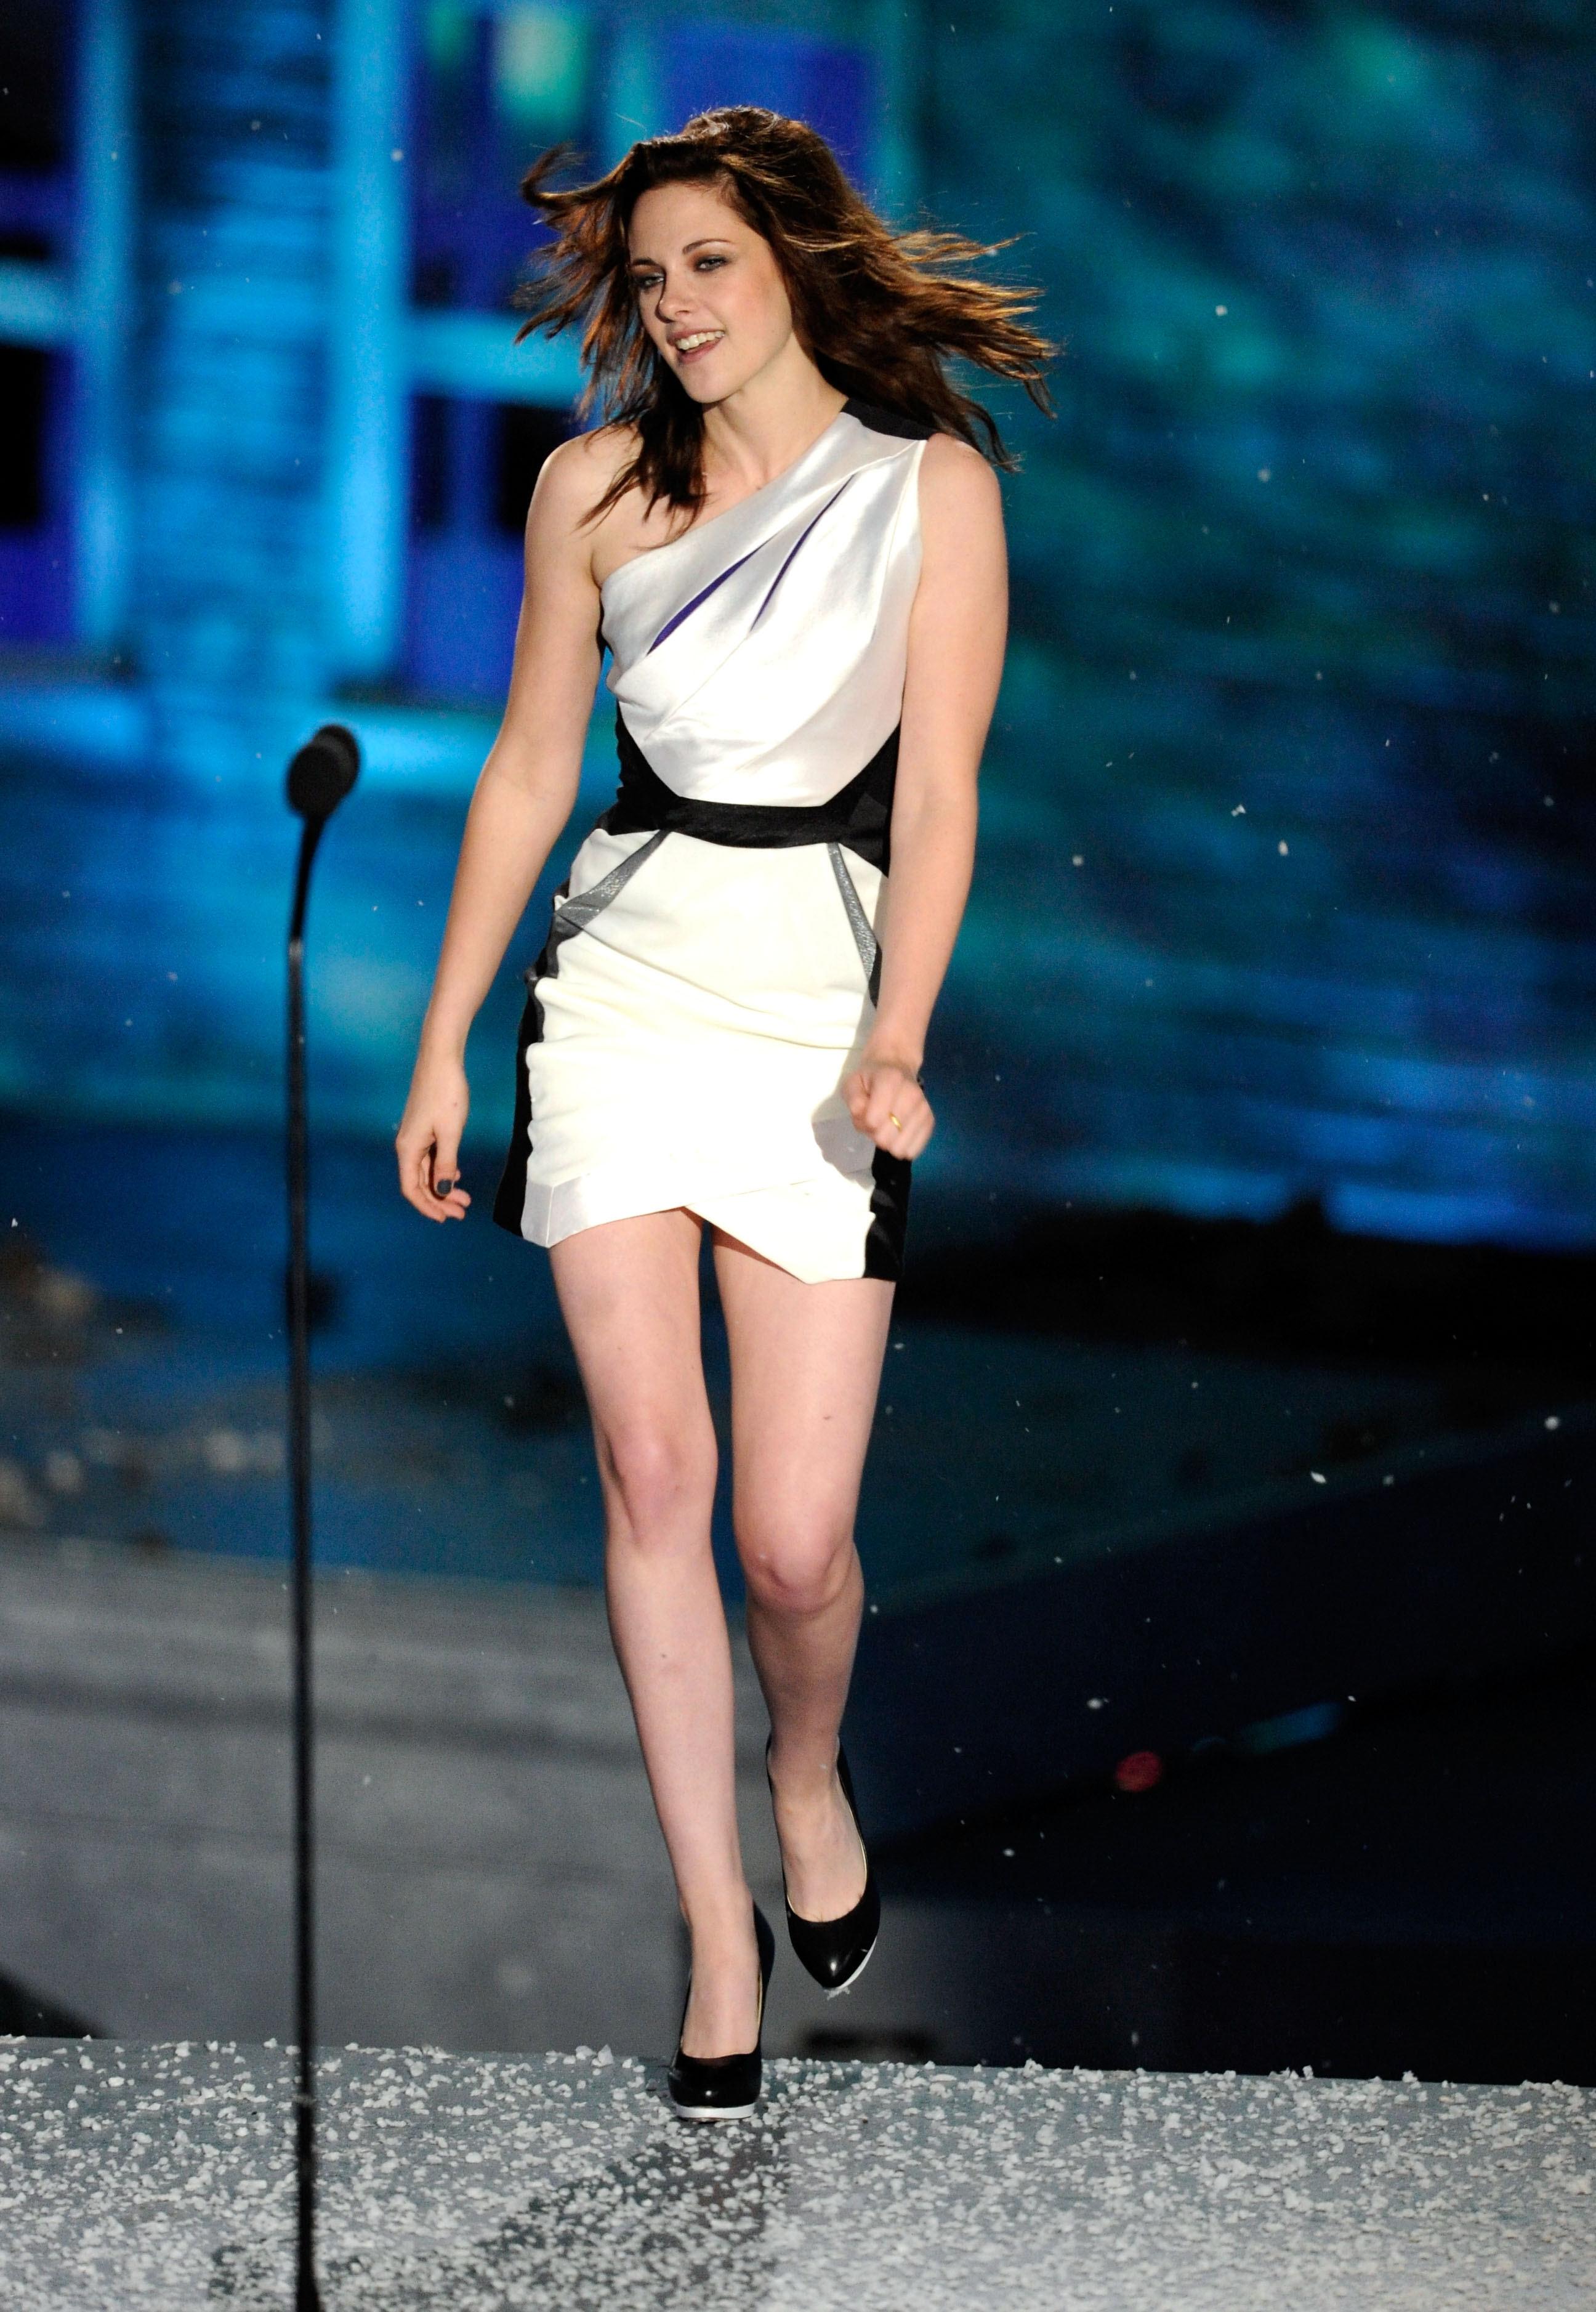 Download this Rbye Dou Kristen Stewart Bikini picture